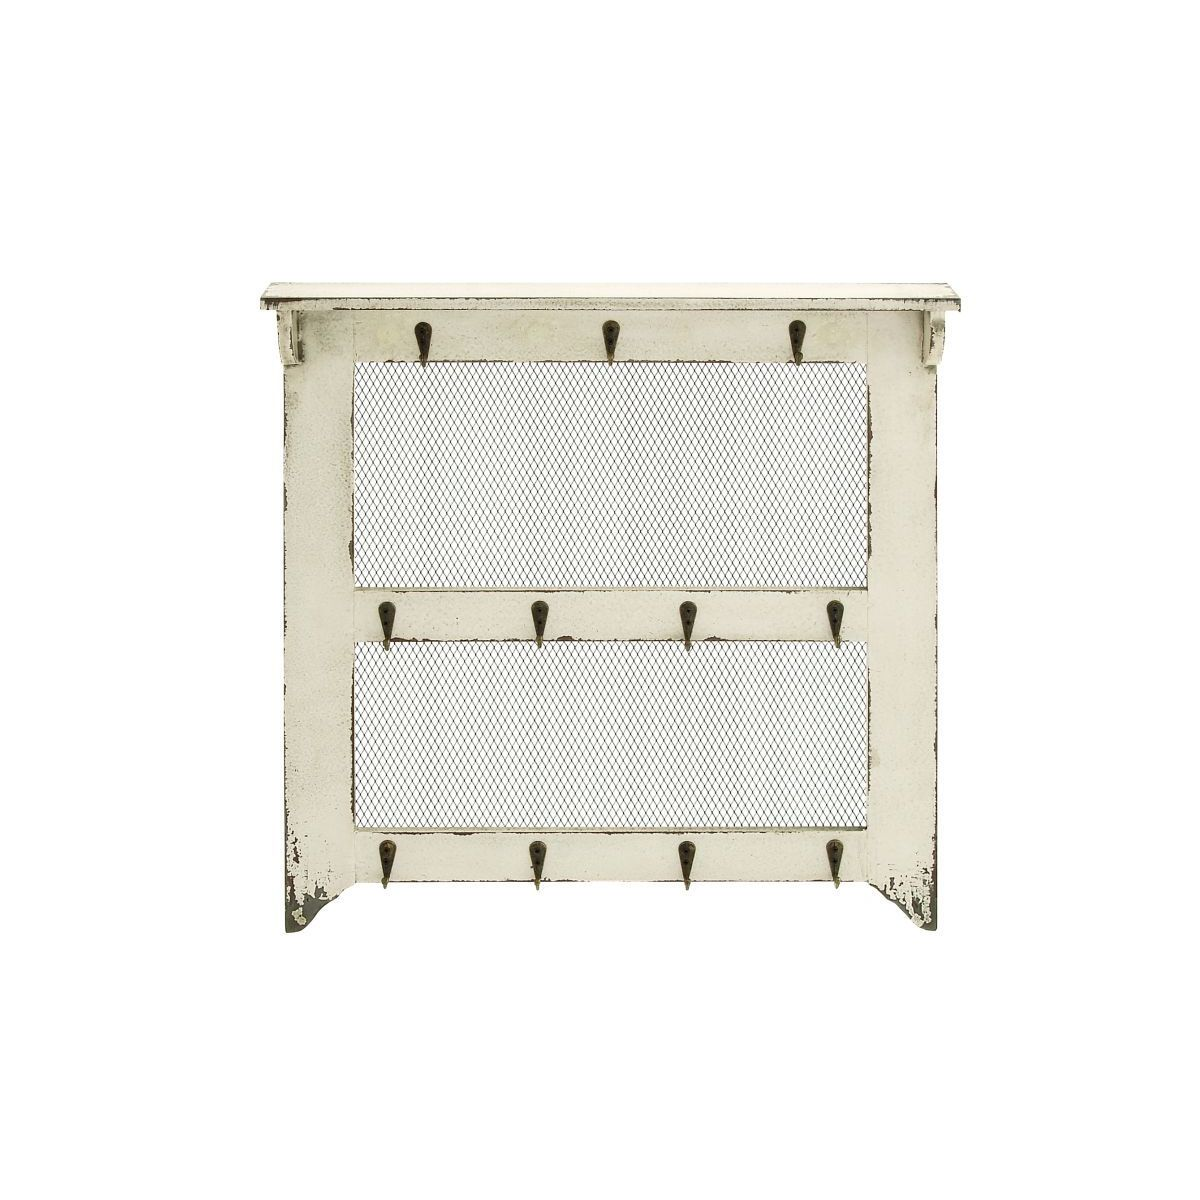 Wood/Metal 19-inch Wide x 20-inch High Wall Hanger